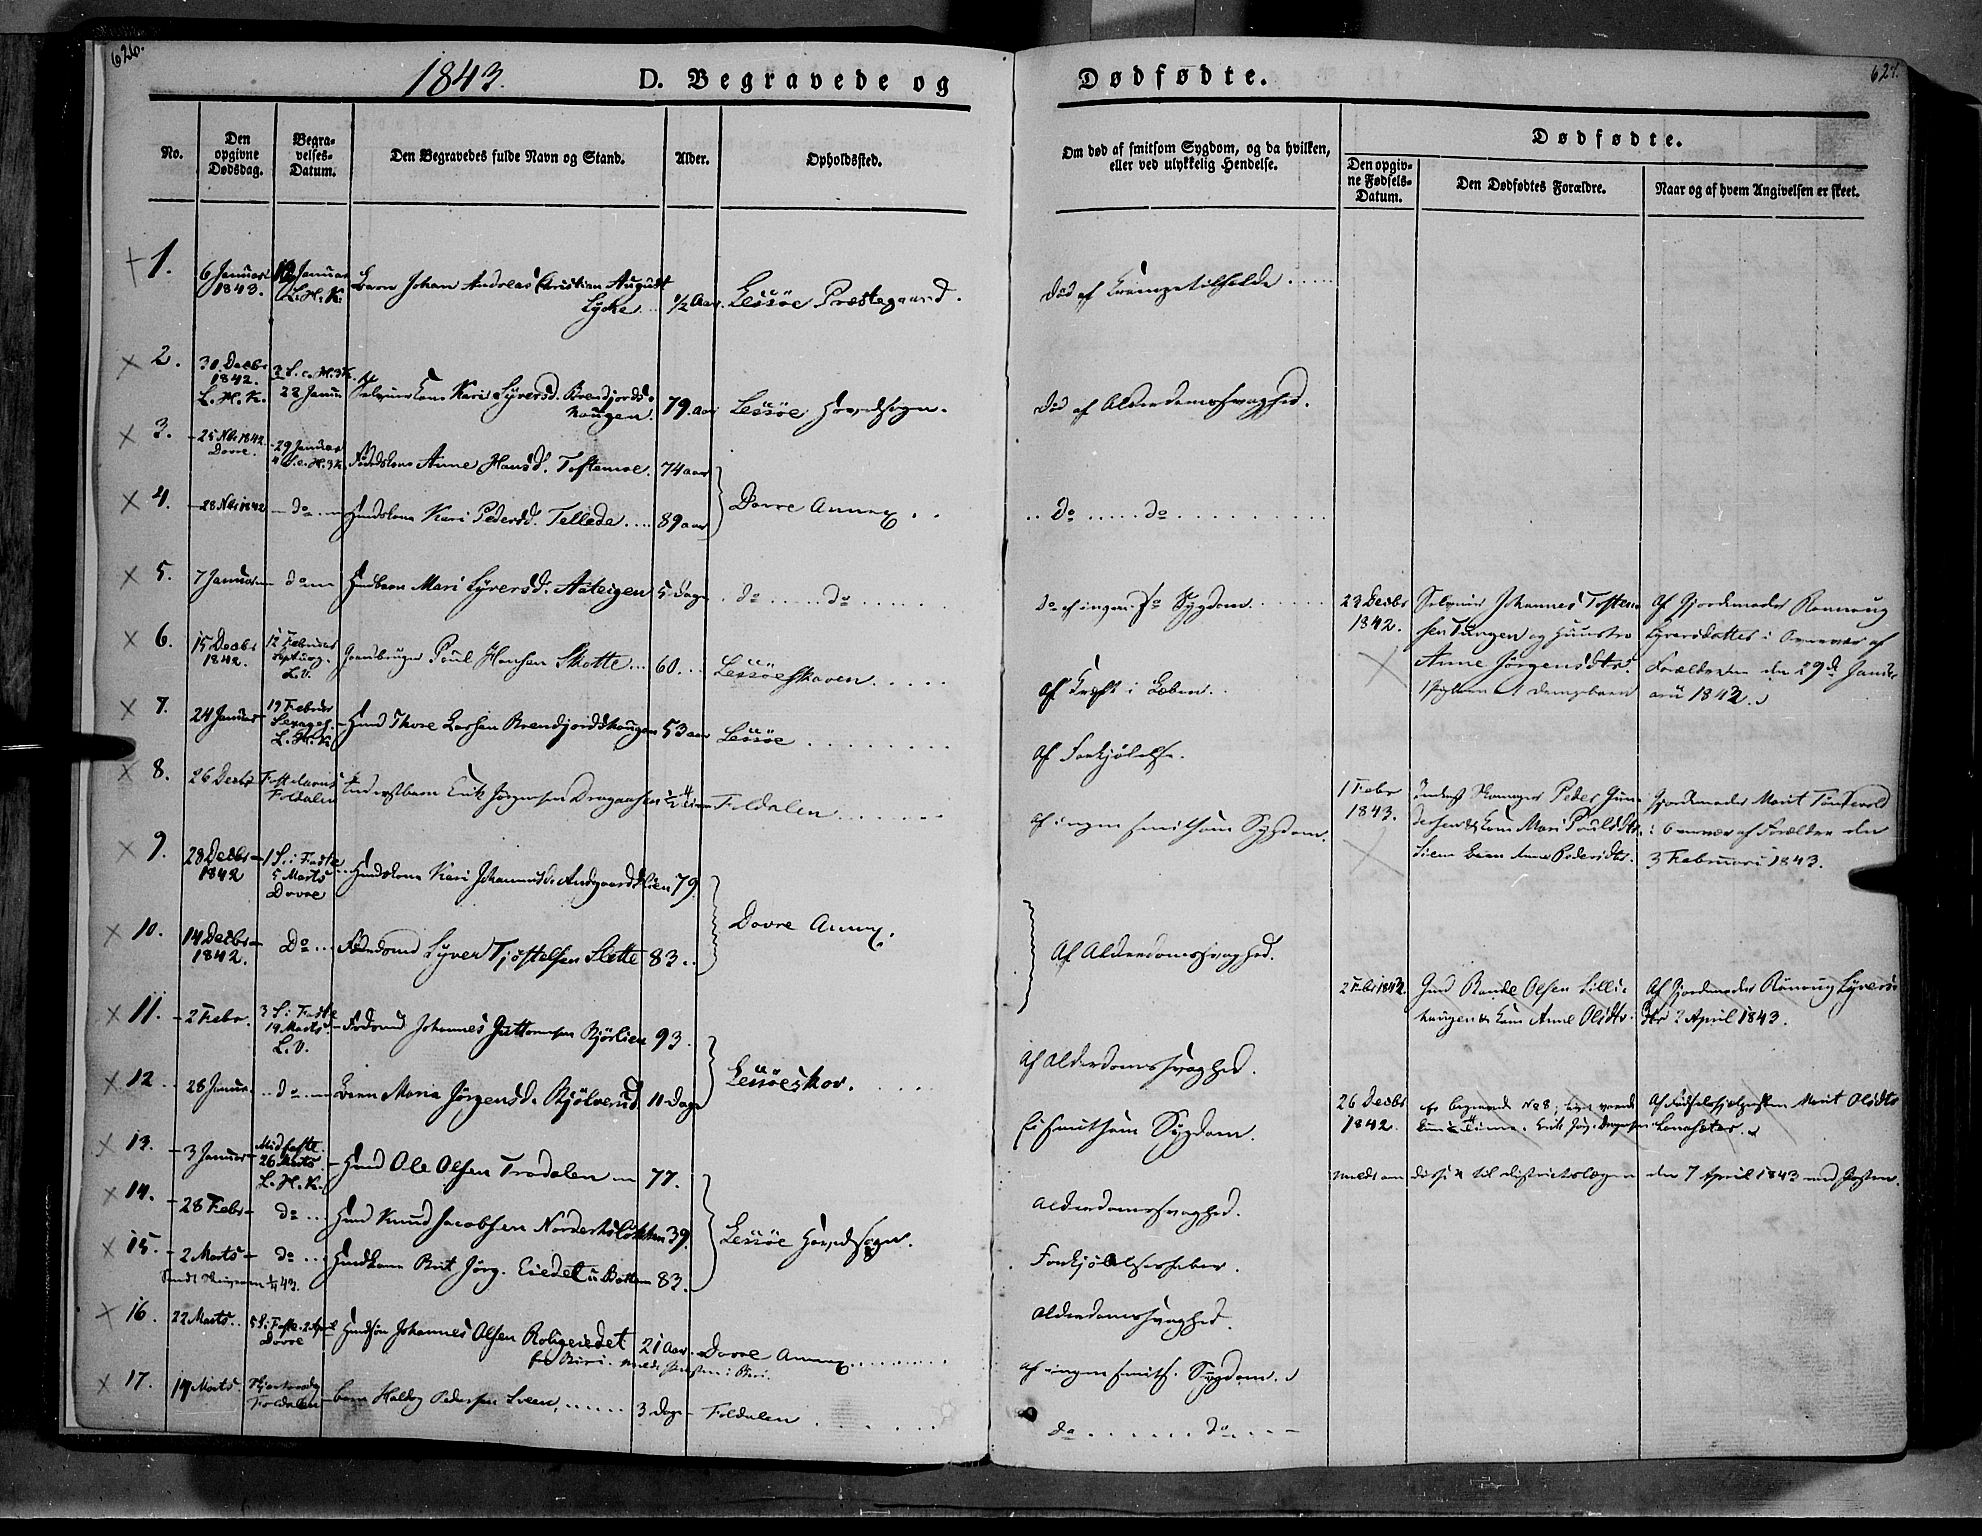 SAH, Lesja prestekontor, Ministerialbok nr. 6B, 1843-1854, s. 626-627